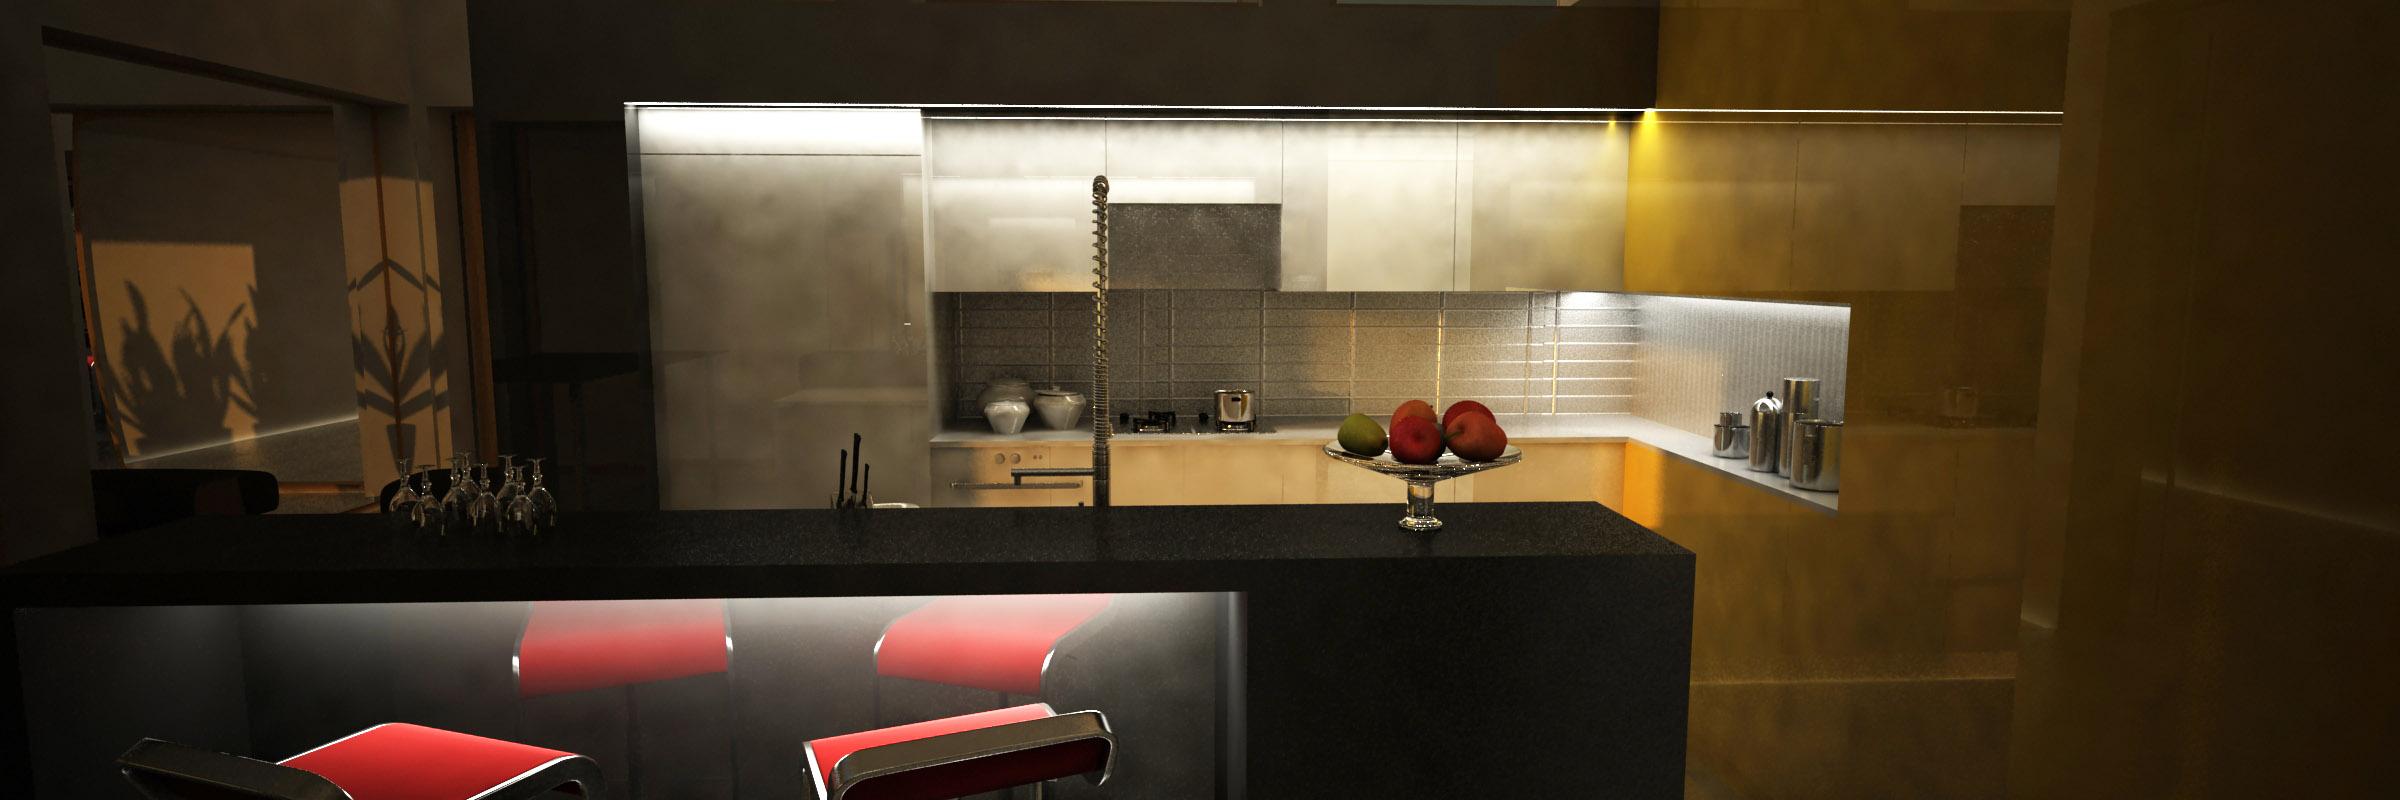 cocina barra diseño